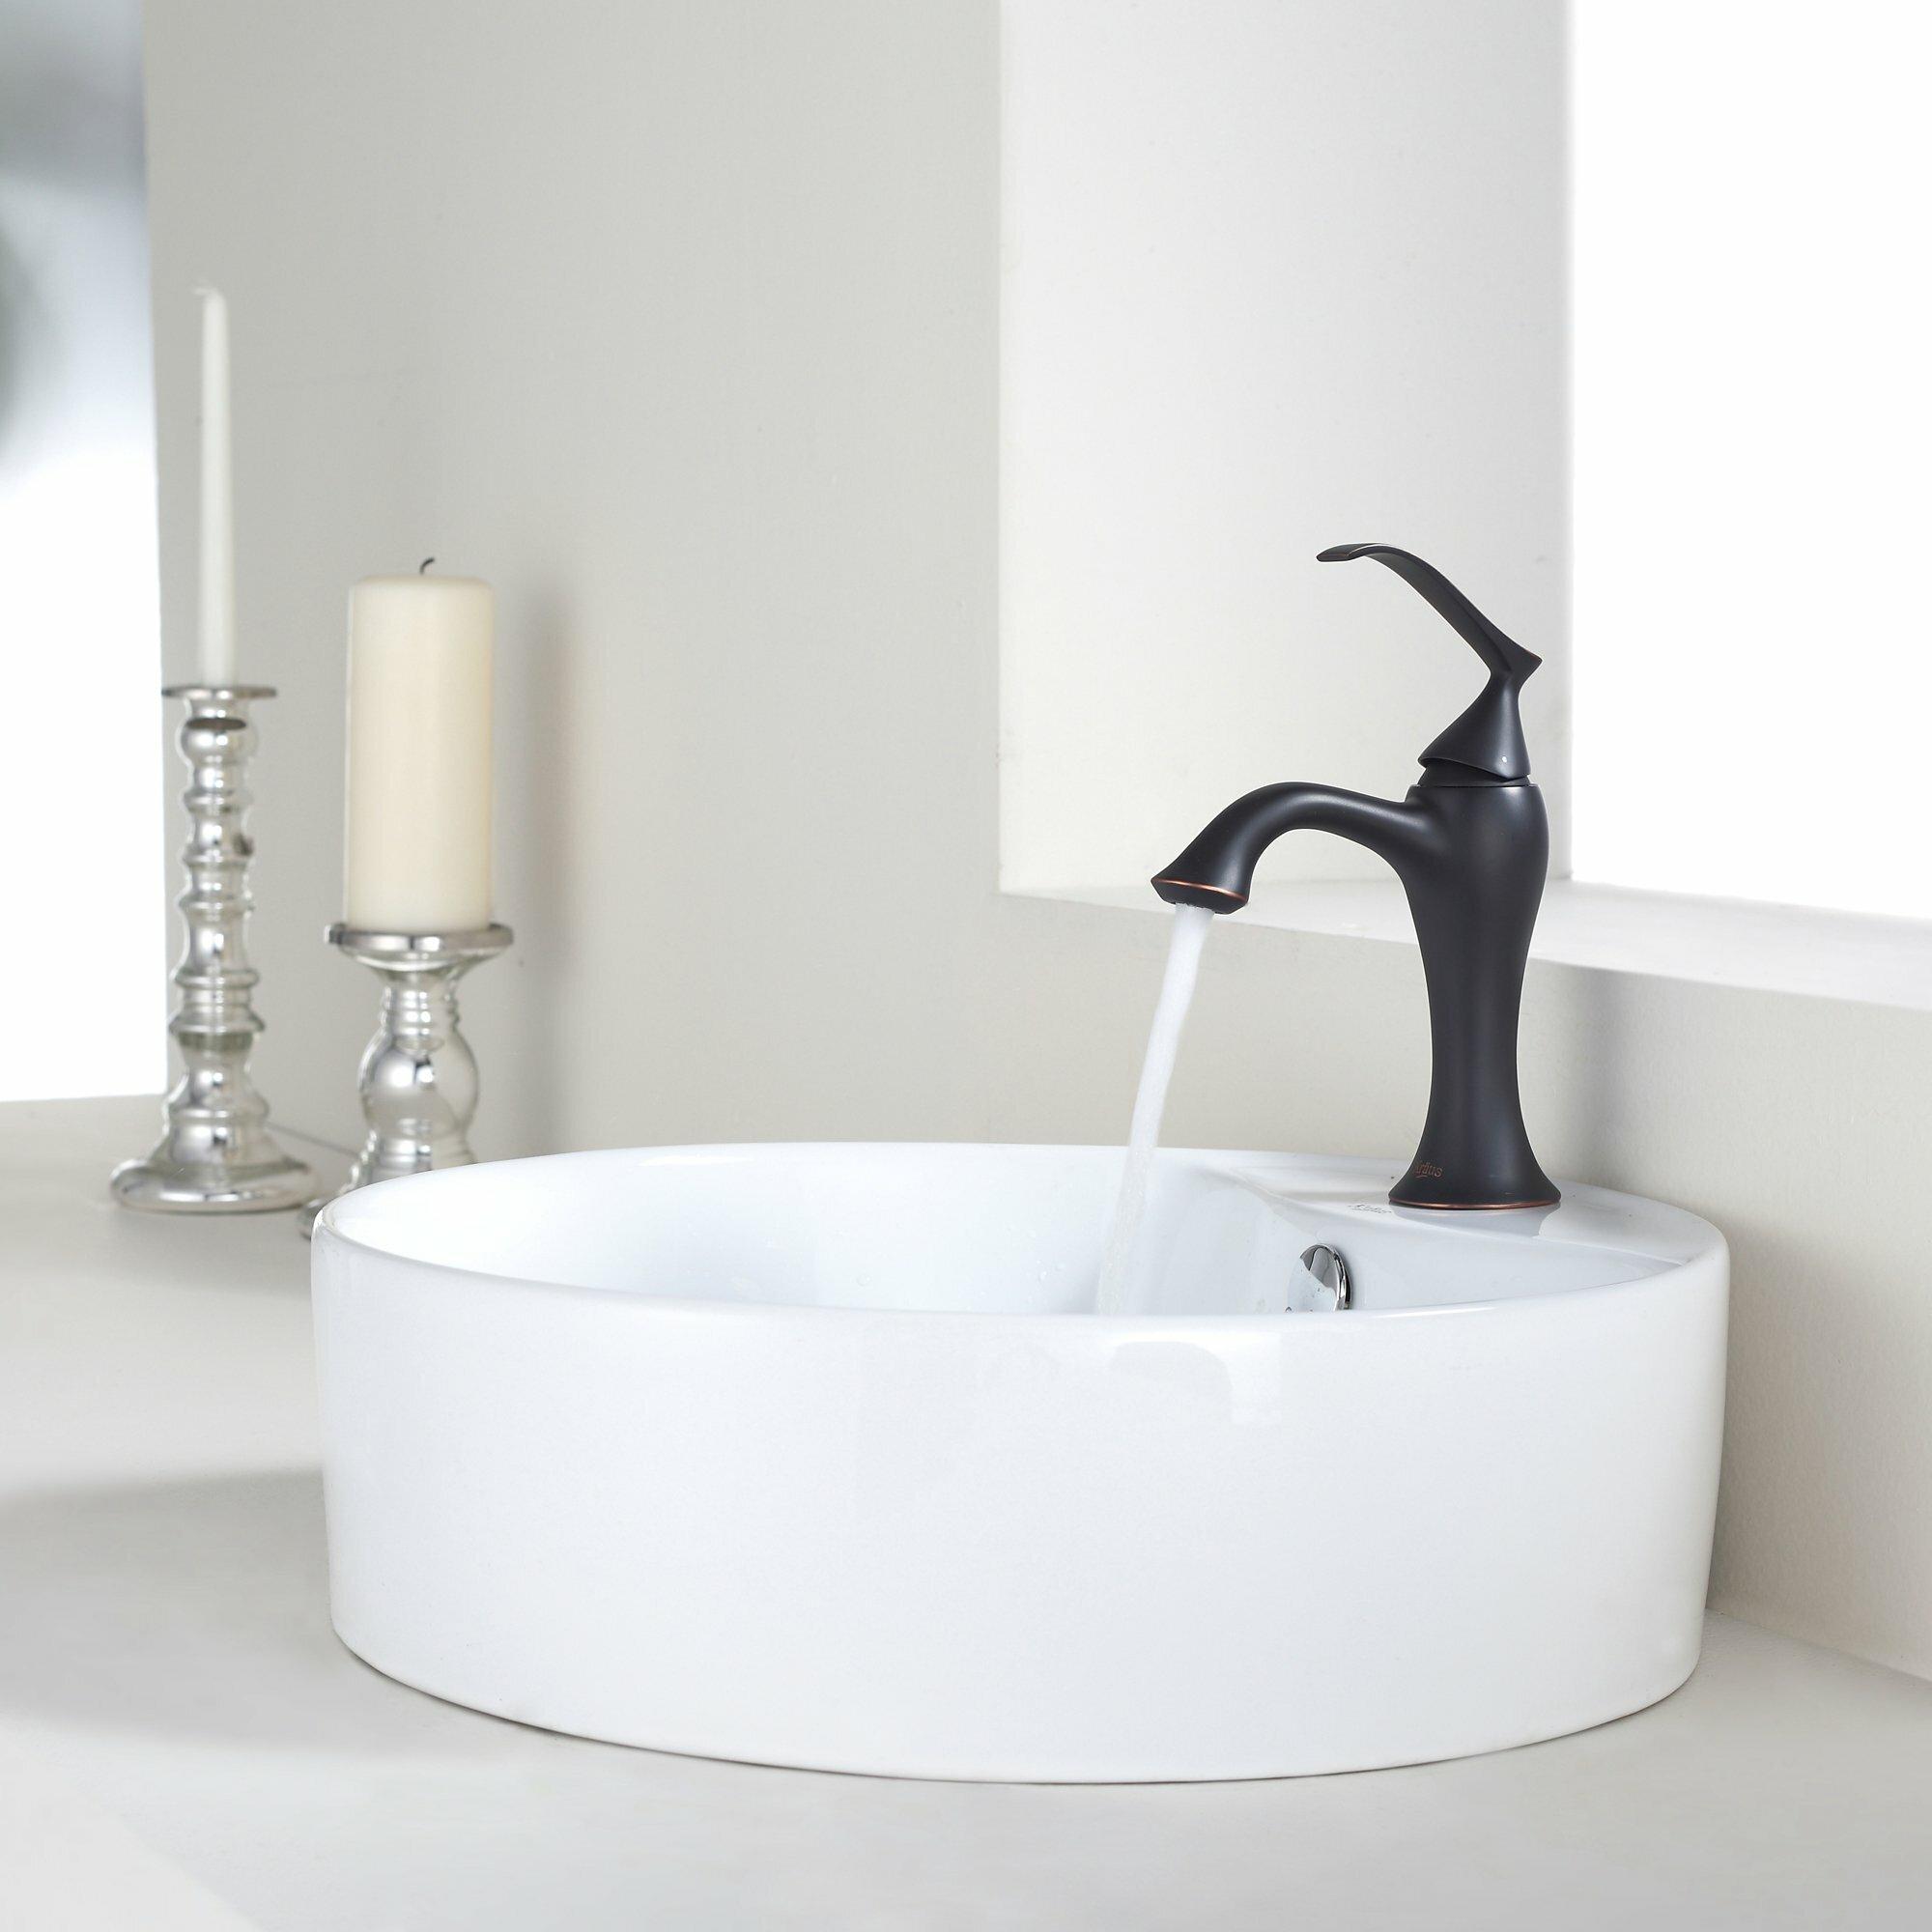 Kraus Bathroom Combos Bathroom Sink With Single Handle